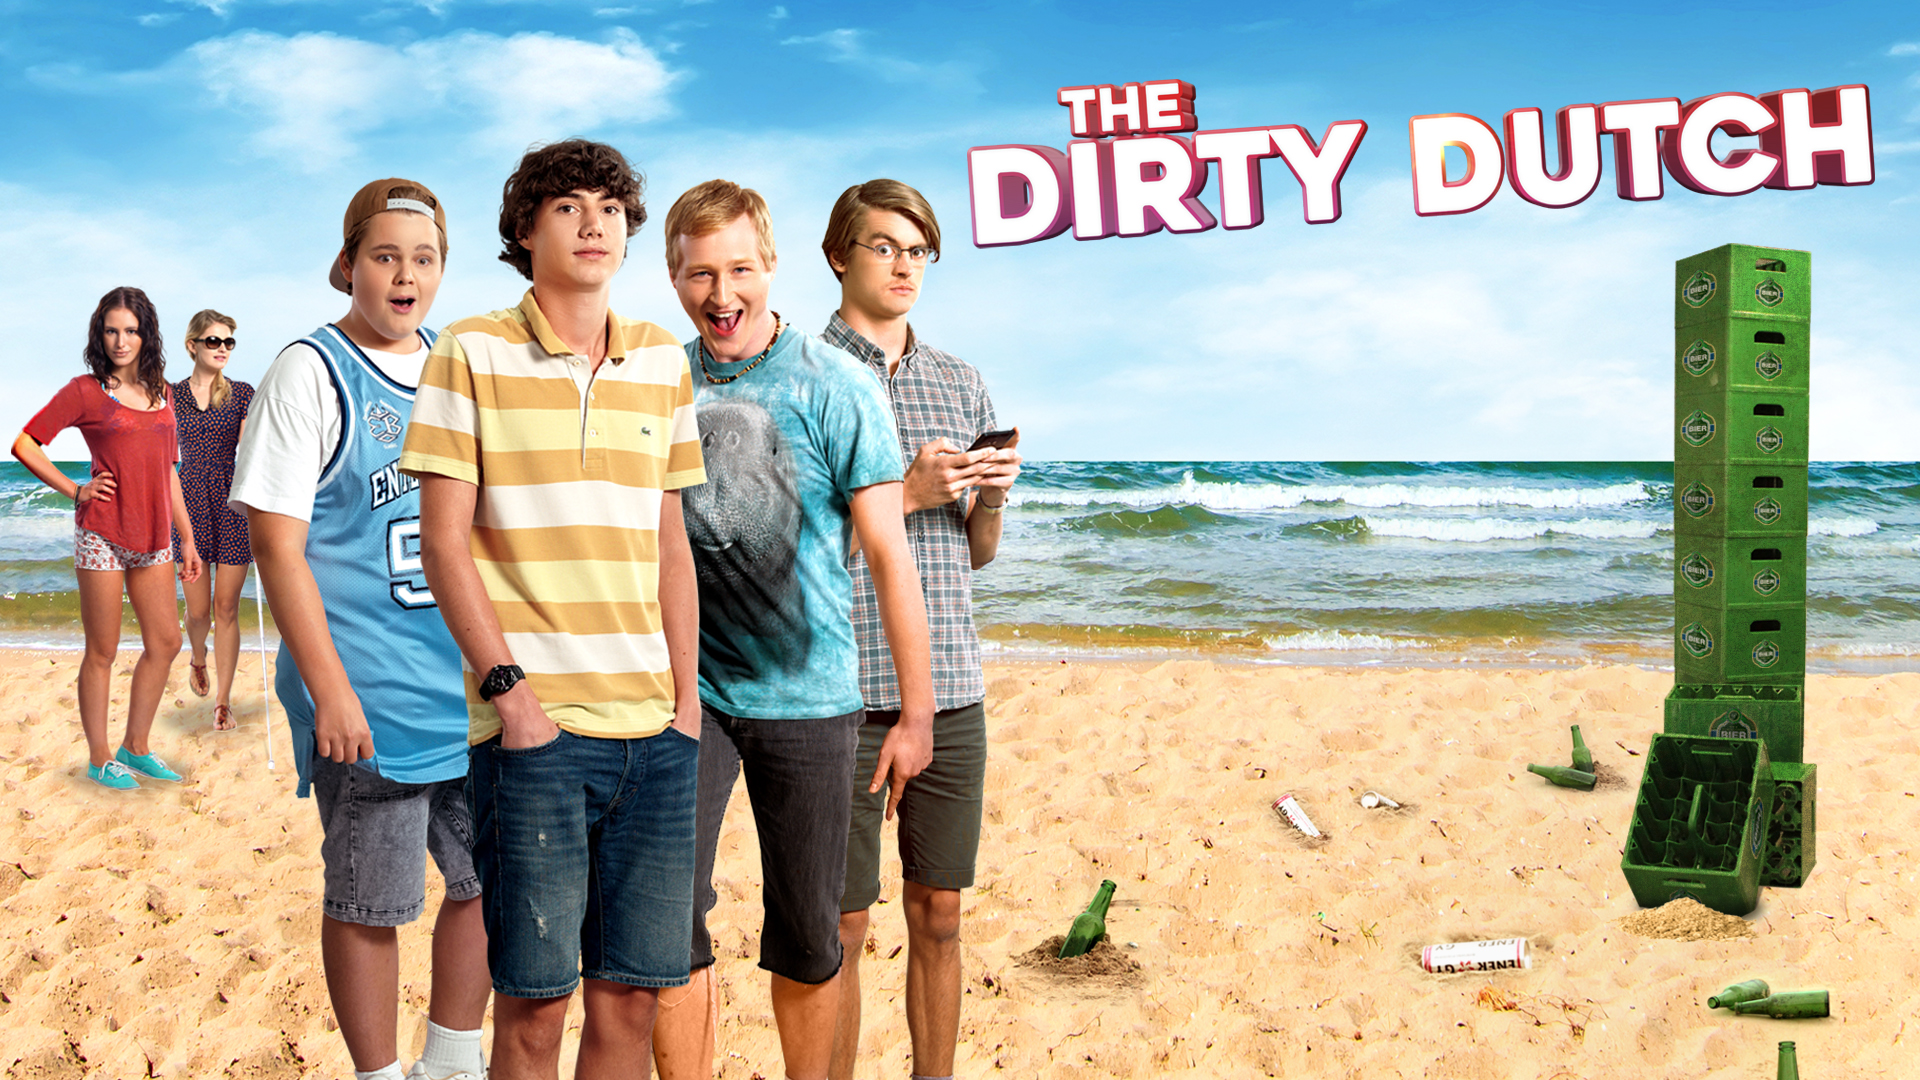 The Dirty Dutch